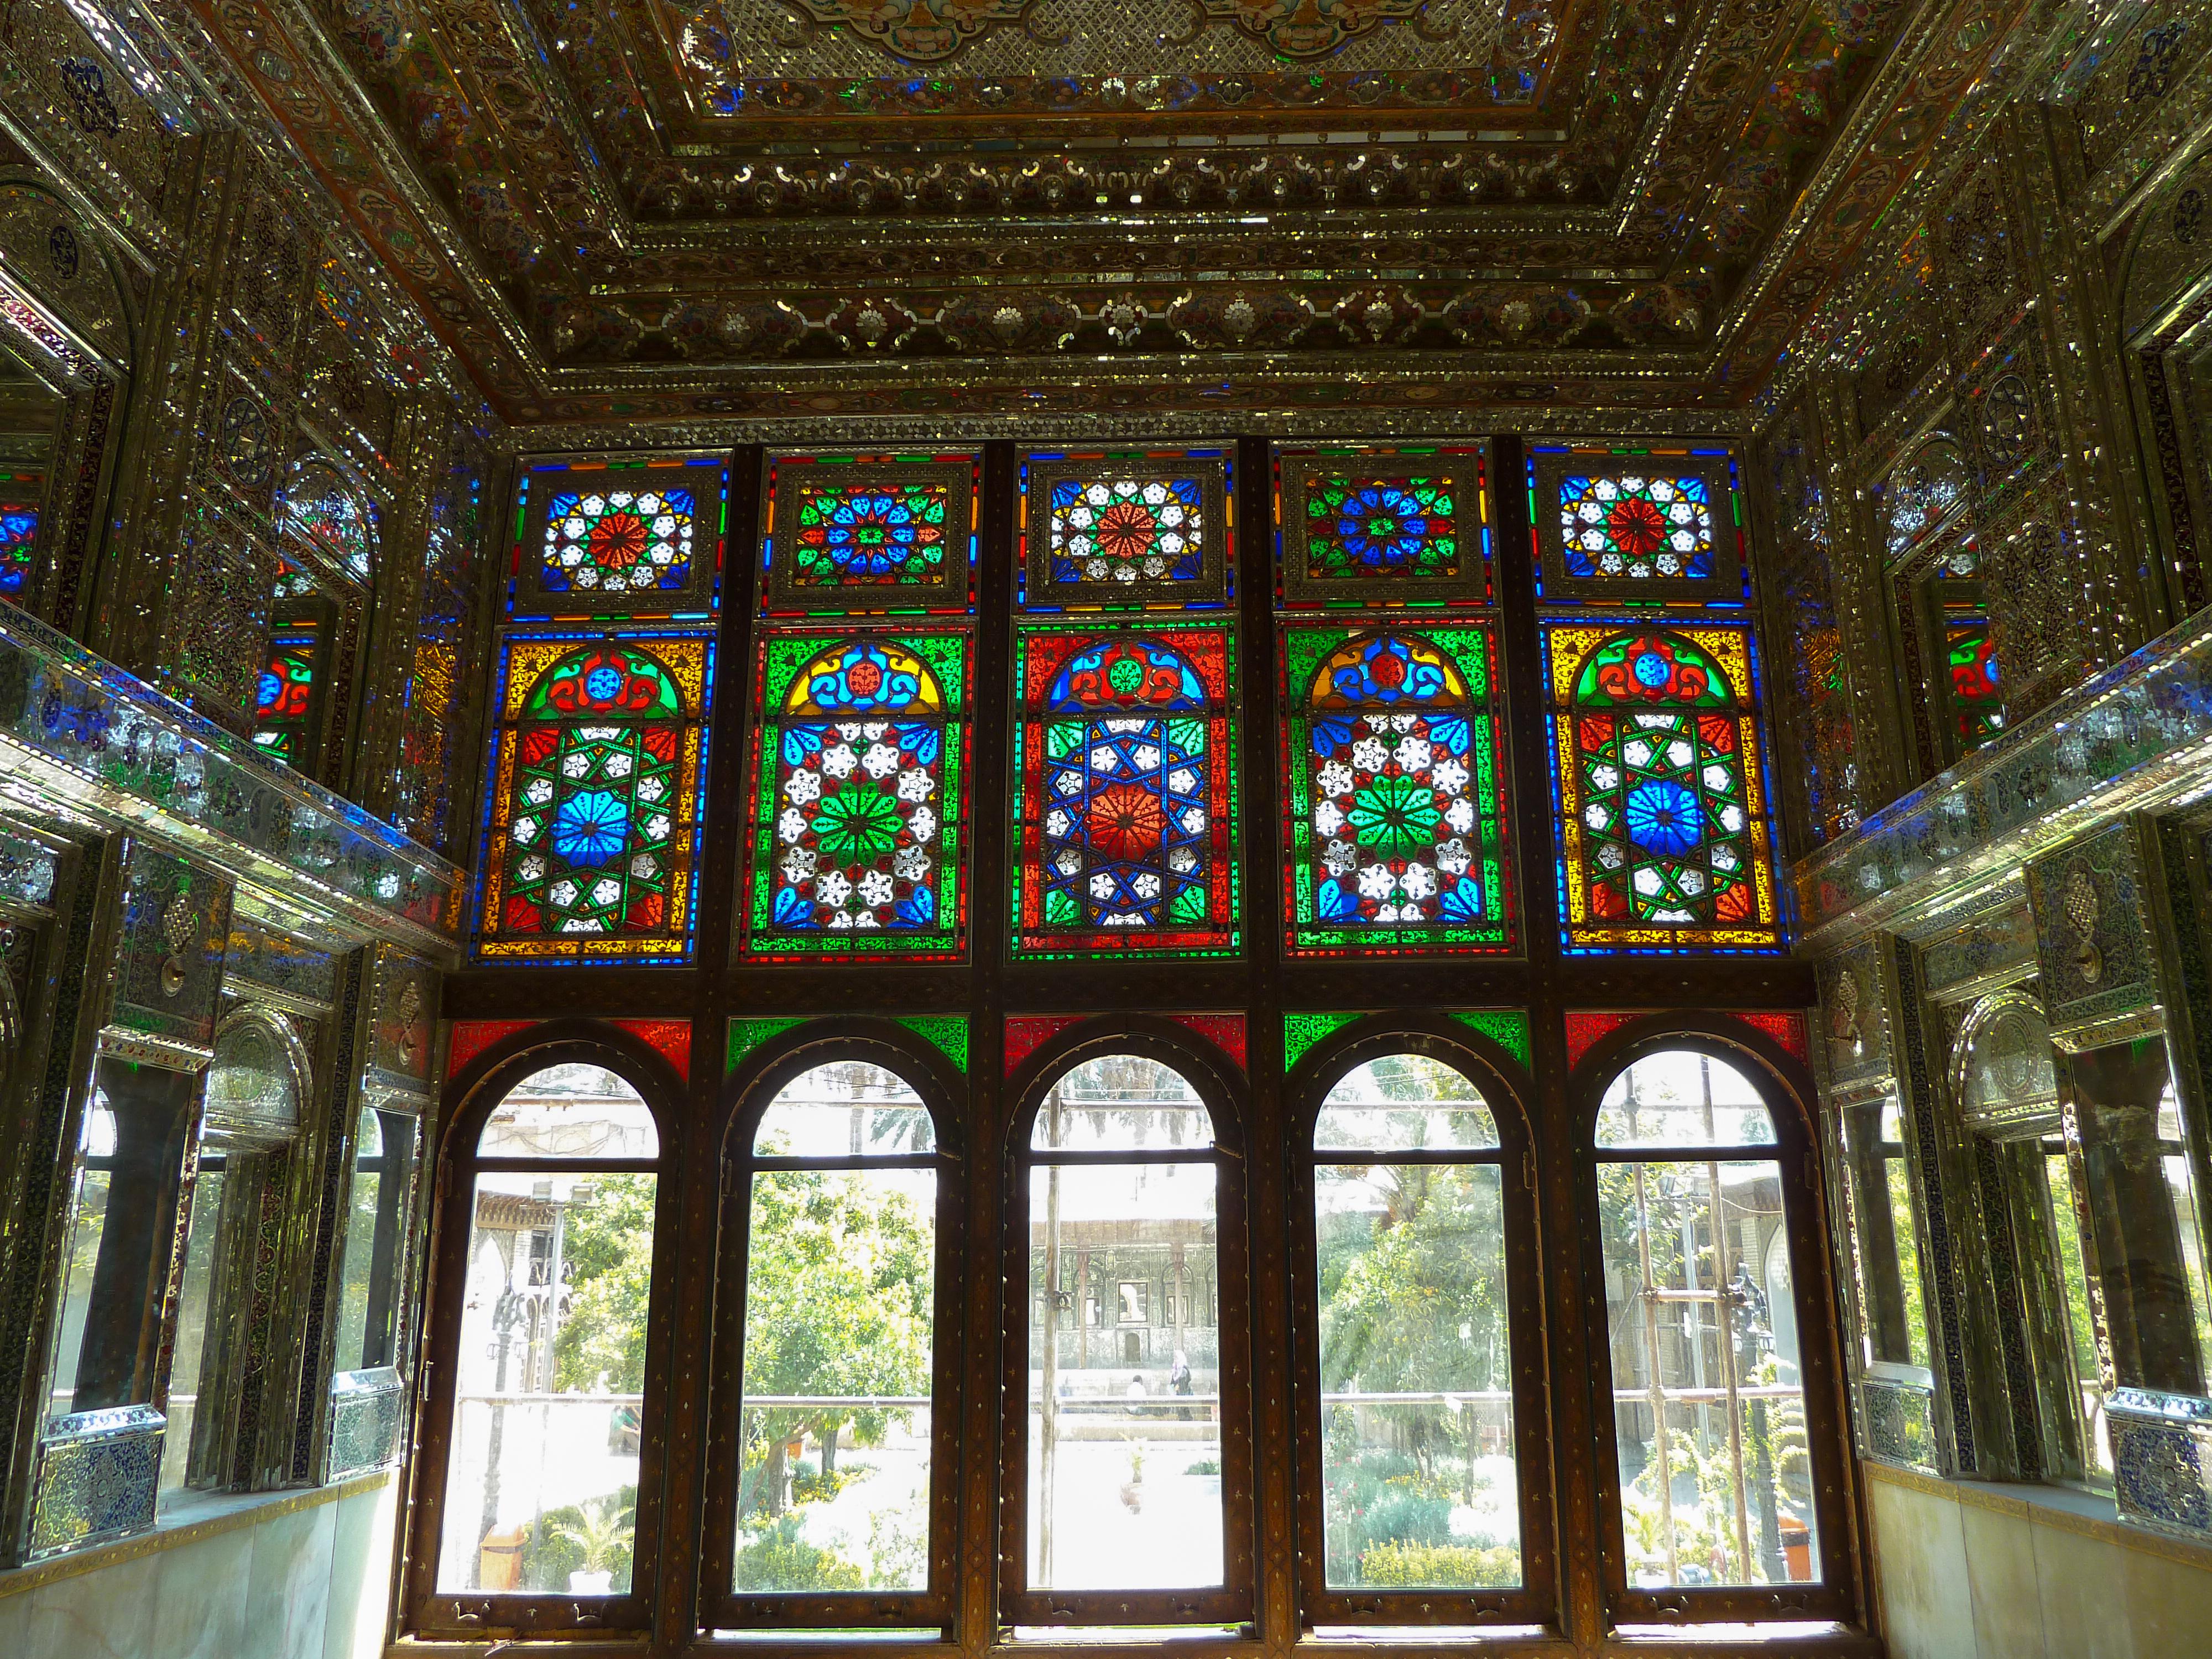 fileqavam house colored glassjpg - Colored Glass